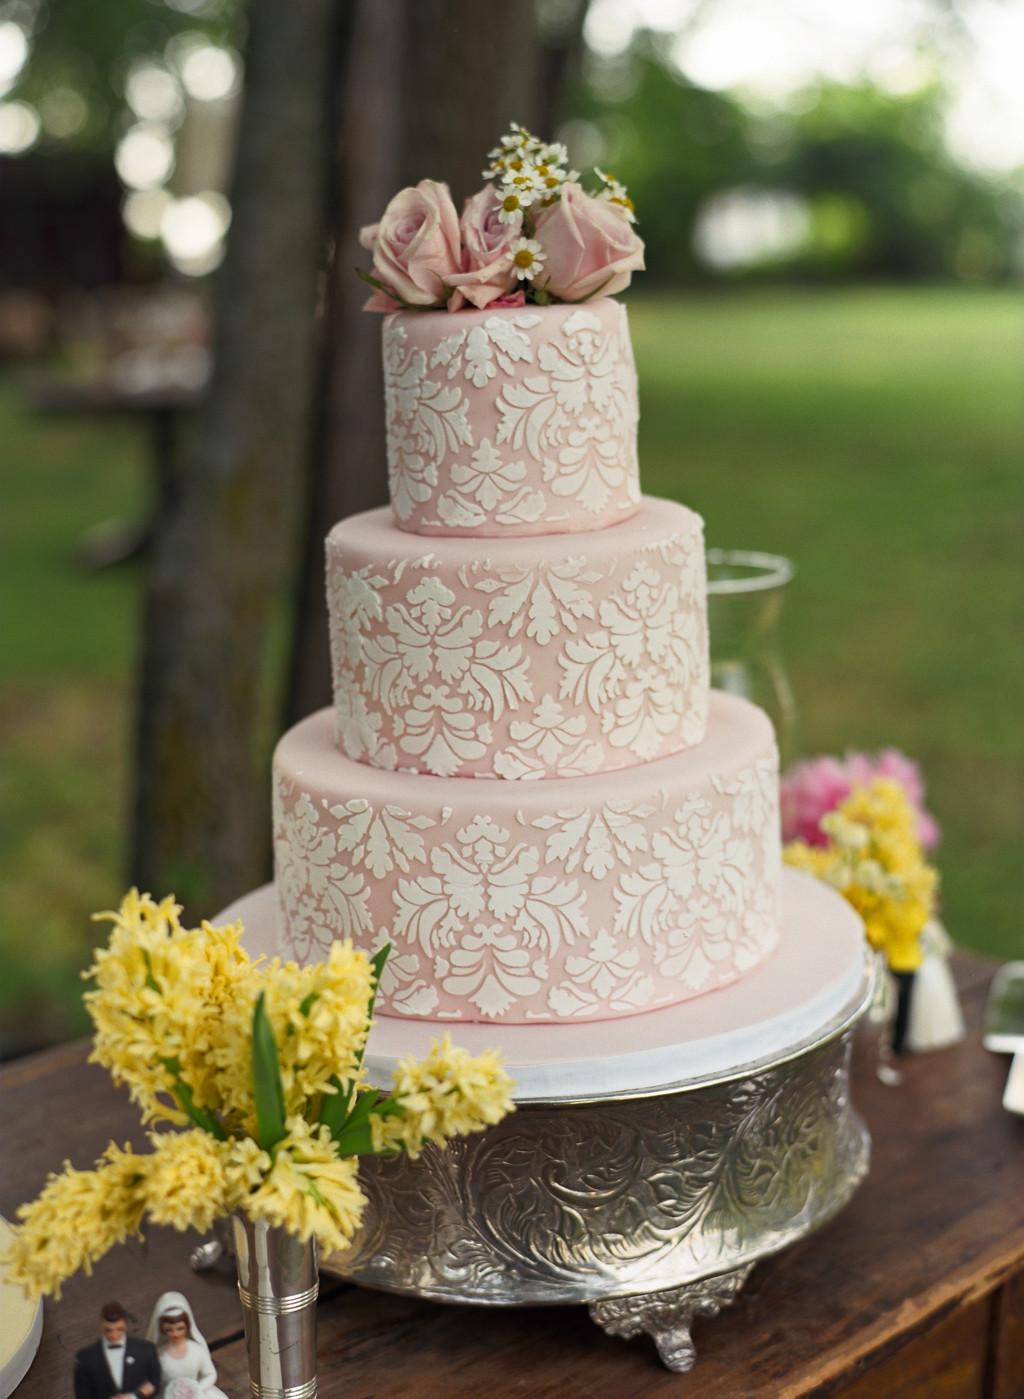 Vintage Wedding Cakes Ideas  wedding cake toppers Fireman Cake Toppers For Wedding Cakes